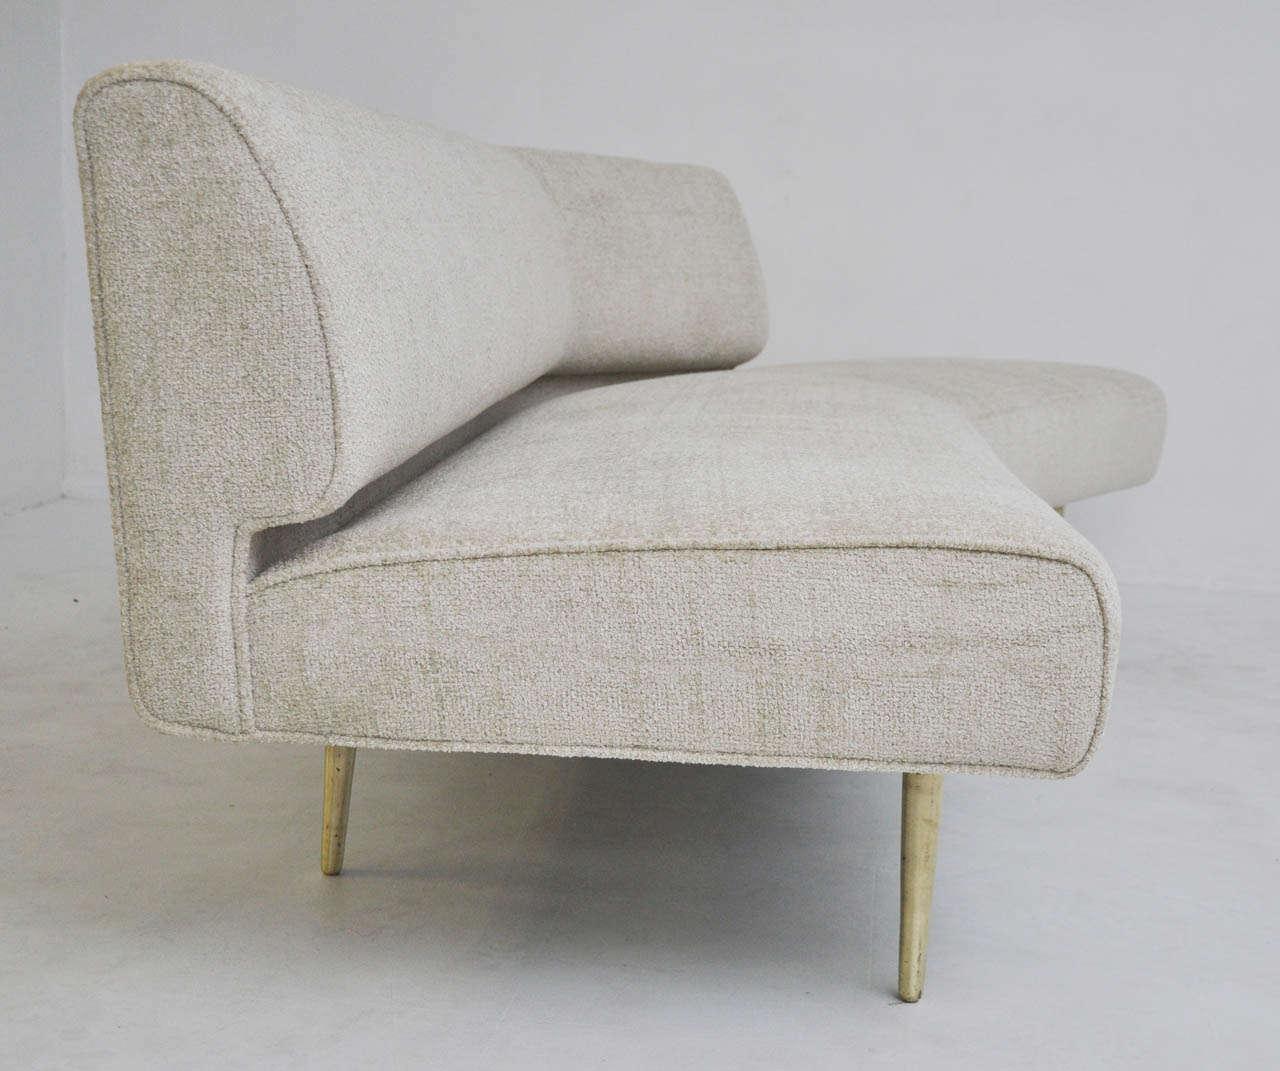 angled sofa legs chesterfield wigan sofascore dunbar edward wormley at 1stdibs